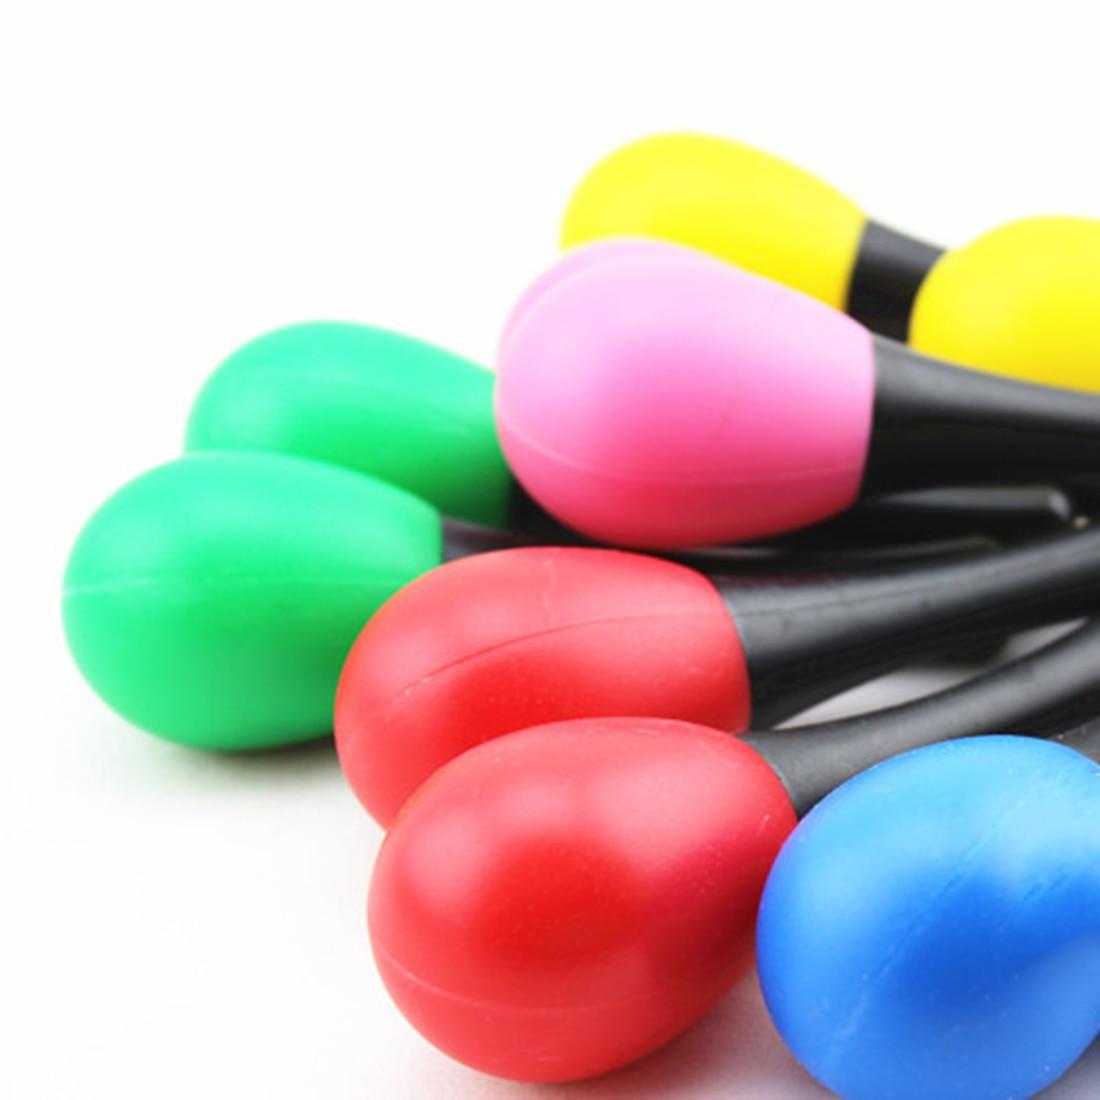 Surwish-2Pcs-Plastic-Sand-Hammer-Maraca-Rattle-Shaker-Kids-Musical-Instruments-Baby-Sound-Music-Toy-Random-Color-1